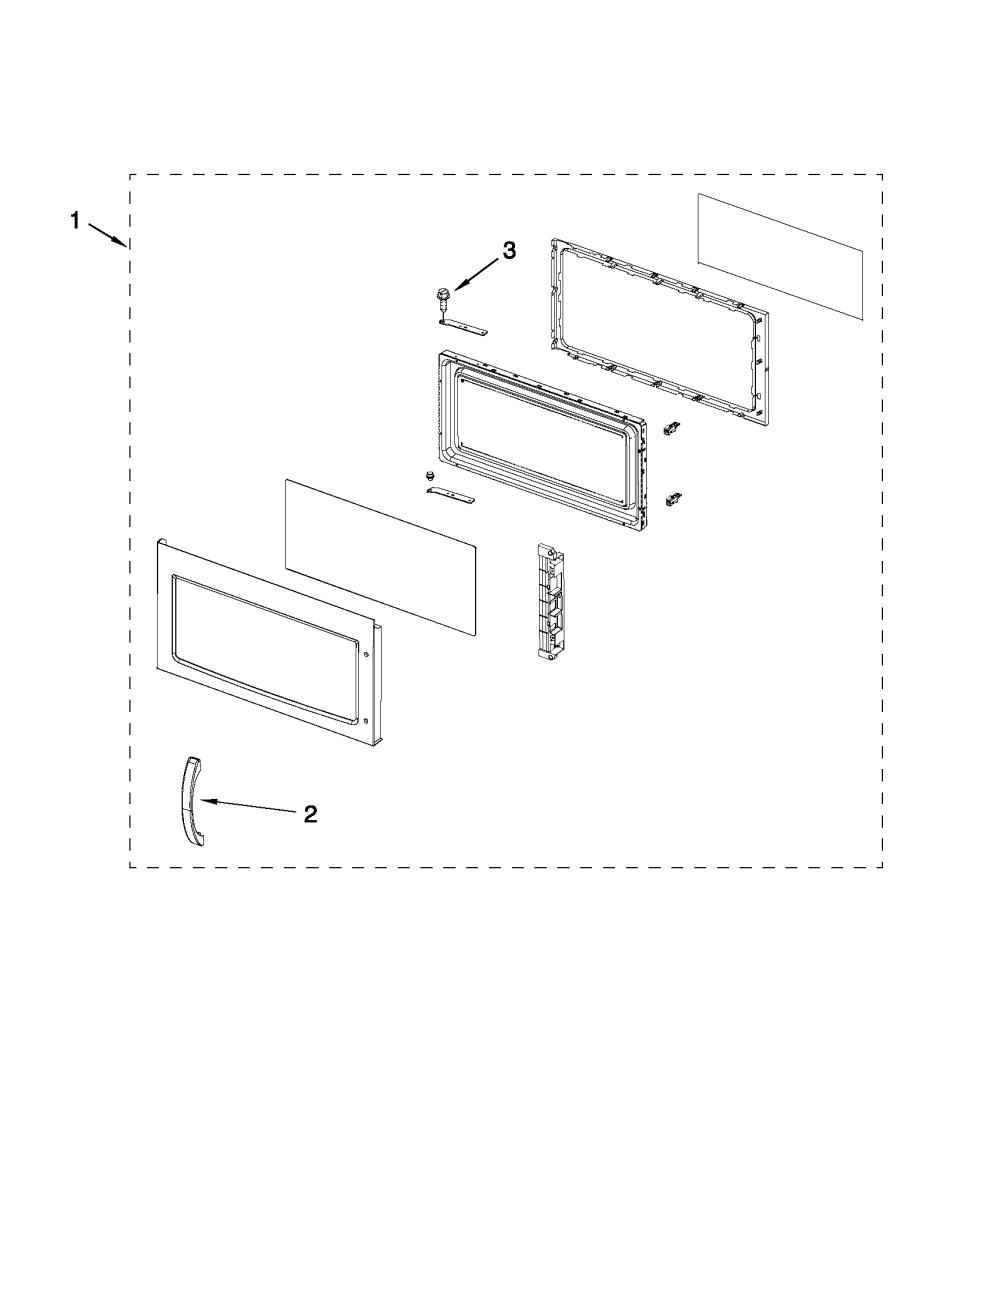 medium resolution of maytag mmv1164ws2 door parts diagram